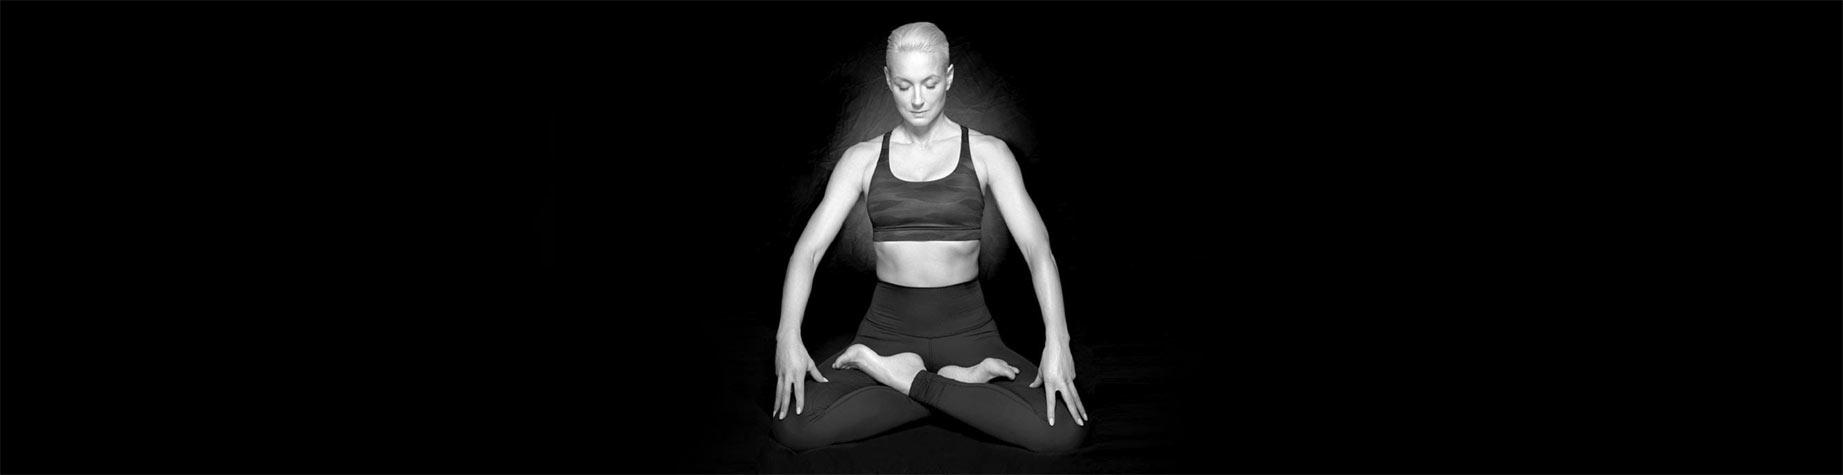 yoga-rezeptur.jpg